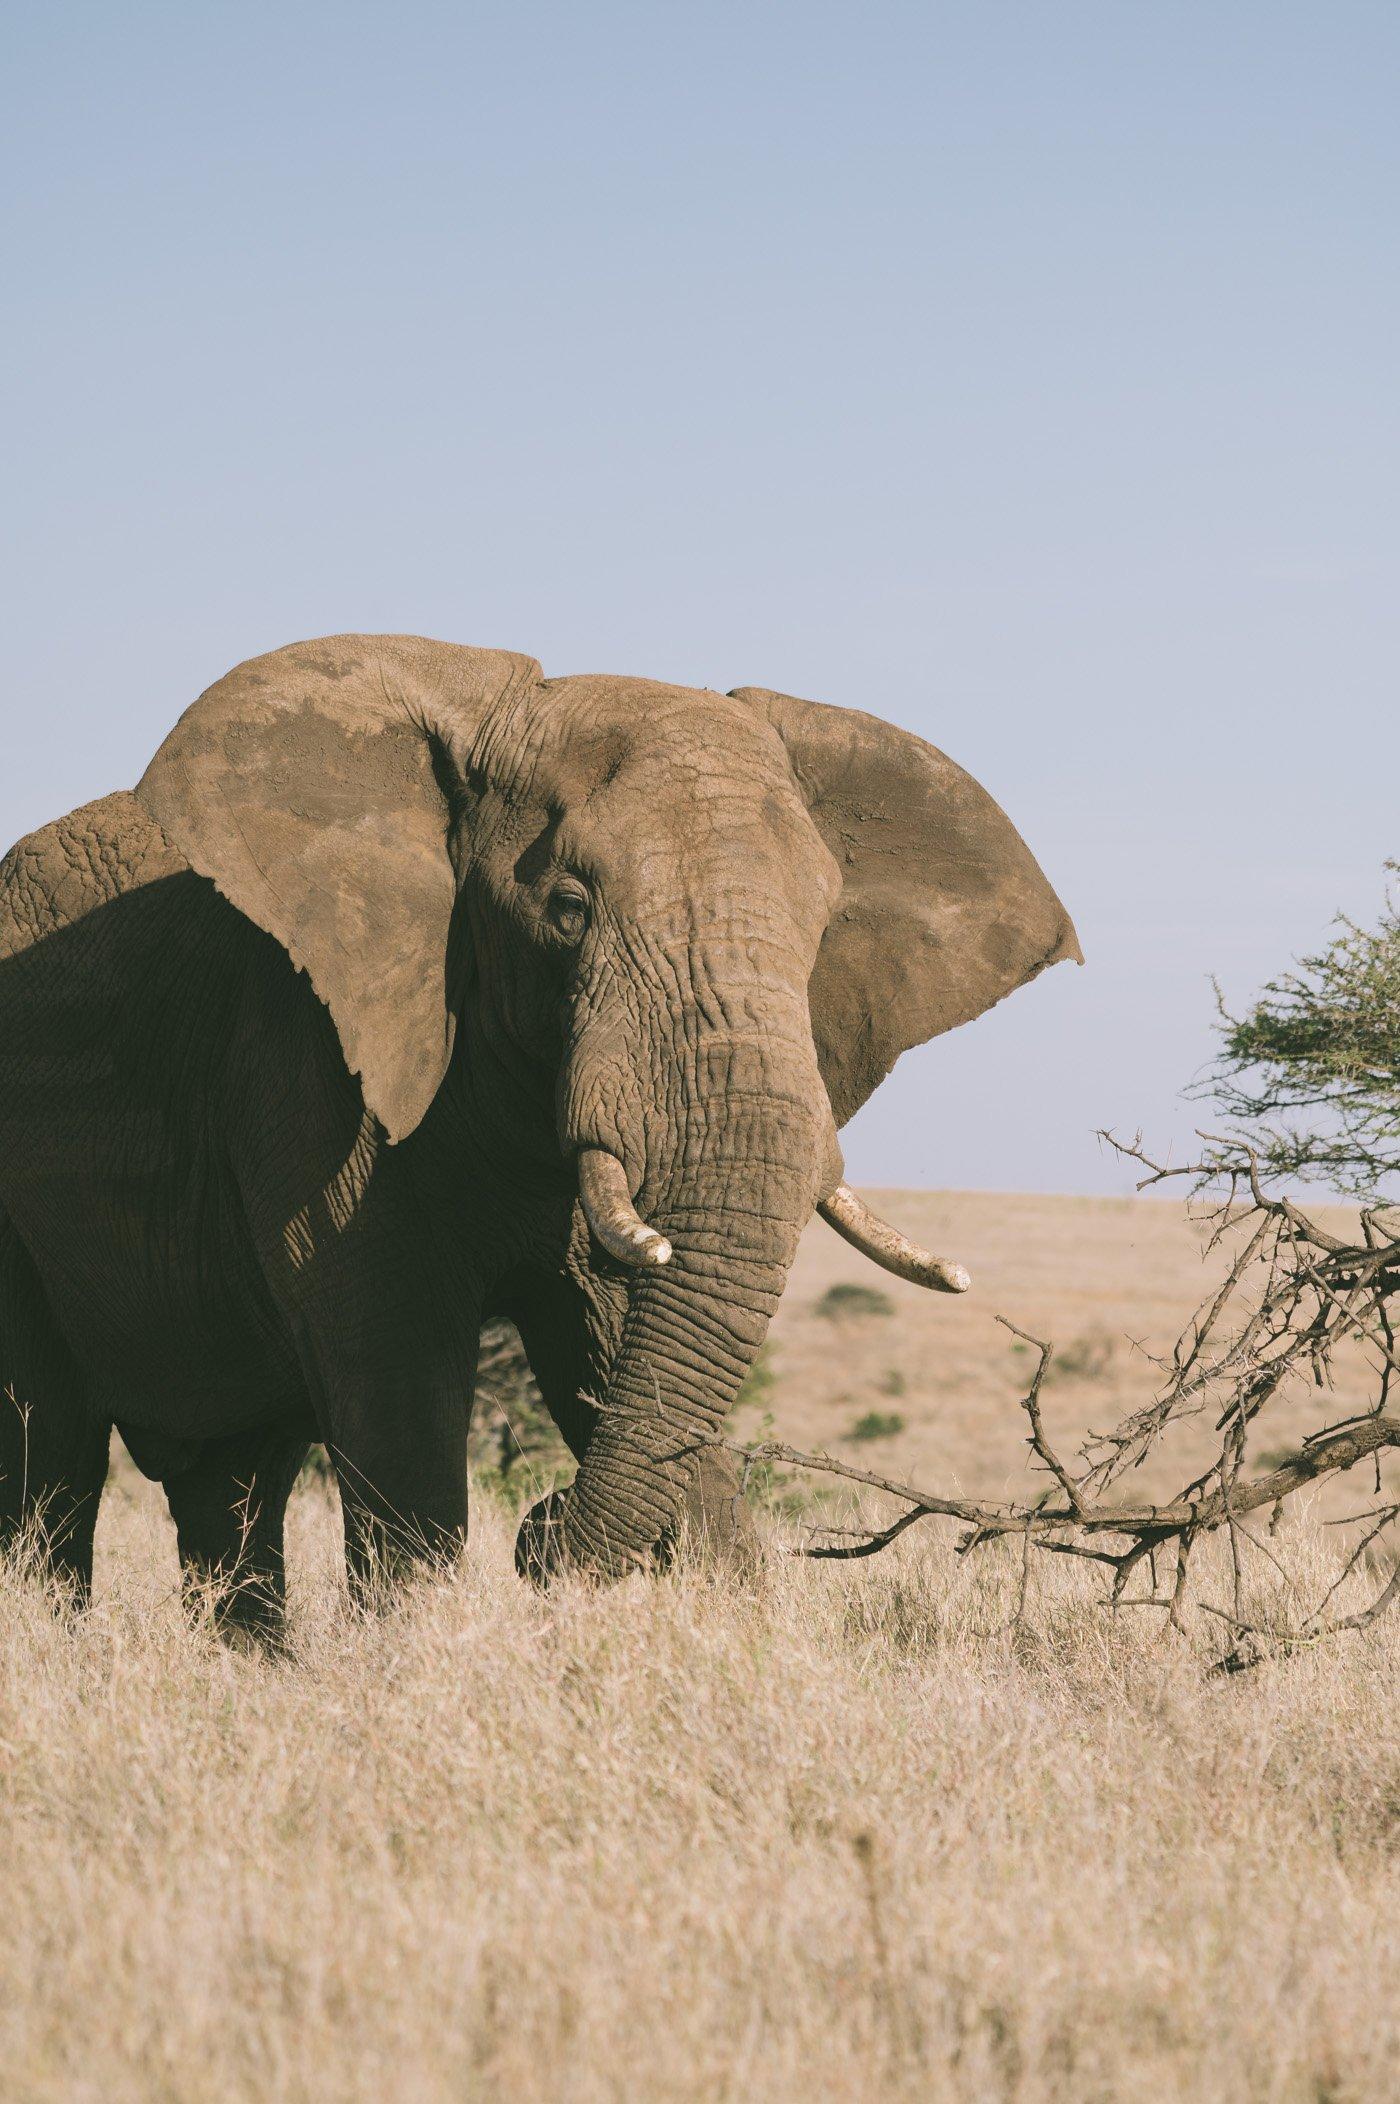 Elephant at Lewa Conservancy Kenya